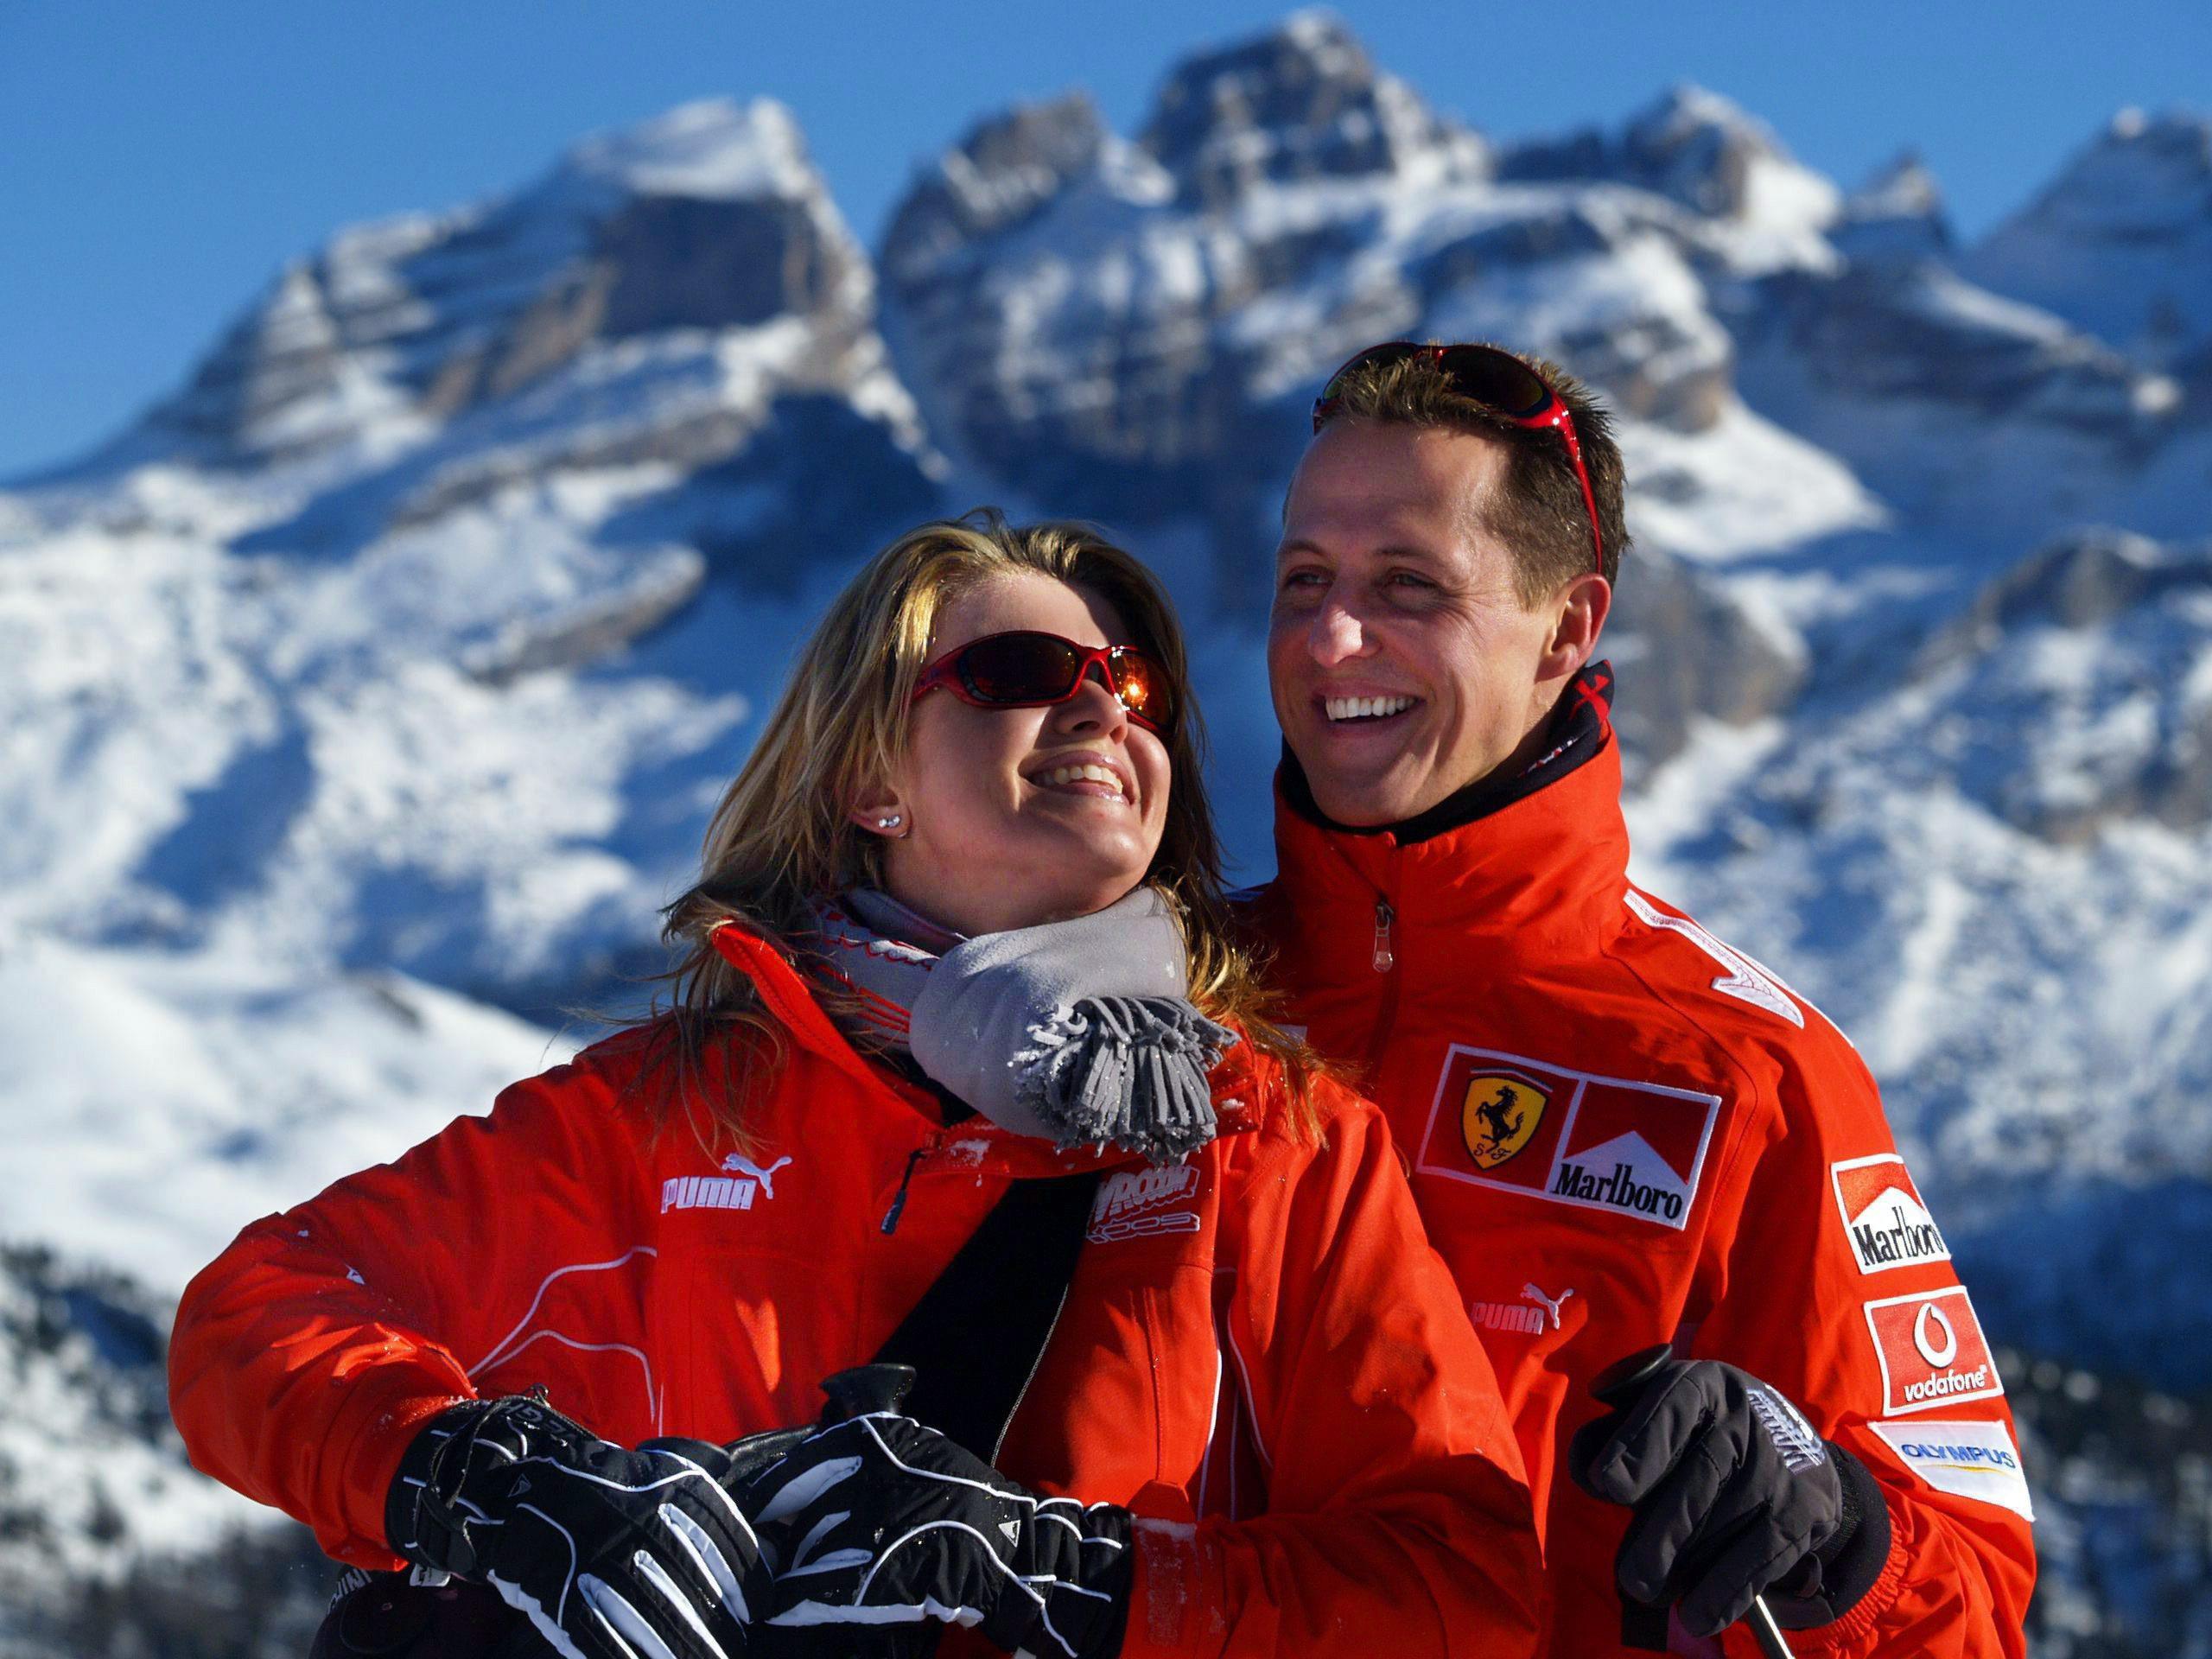 Netflix to stream Schumacher documentary from Sept. 15